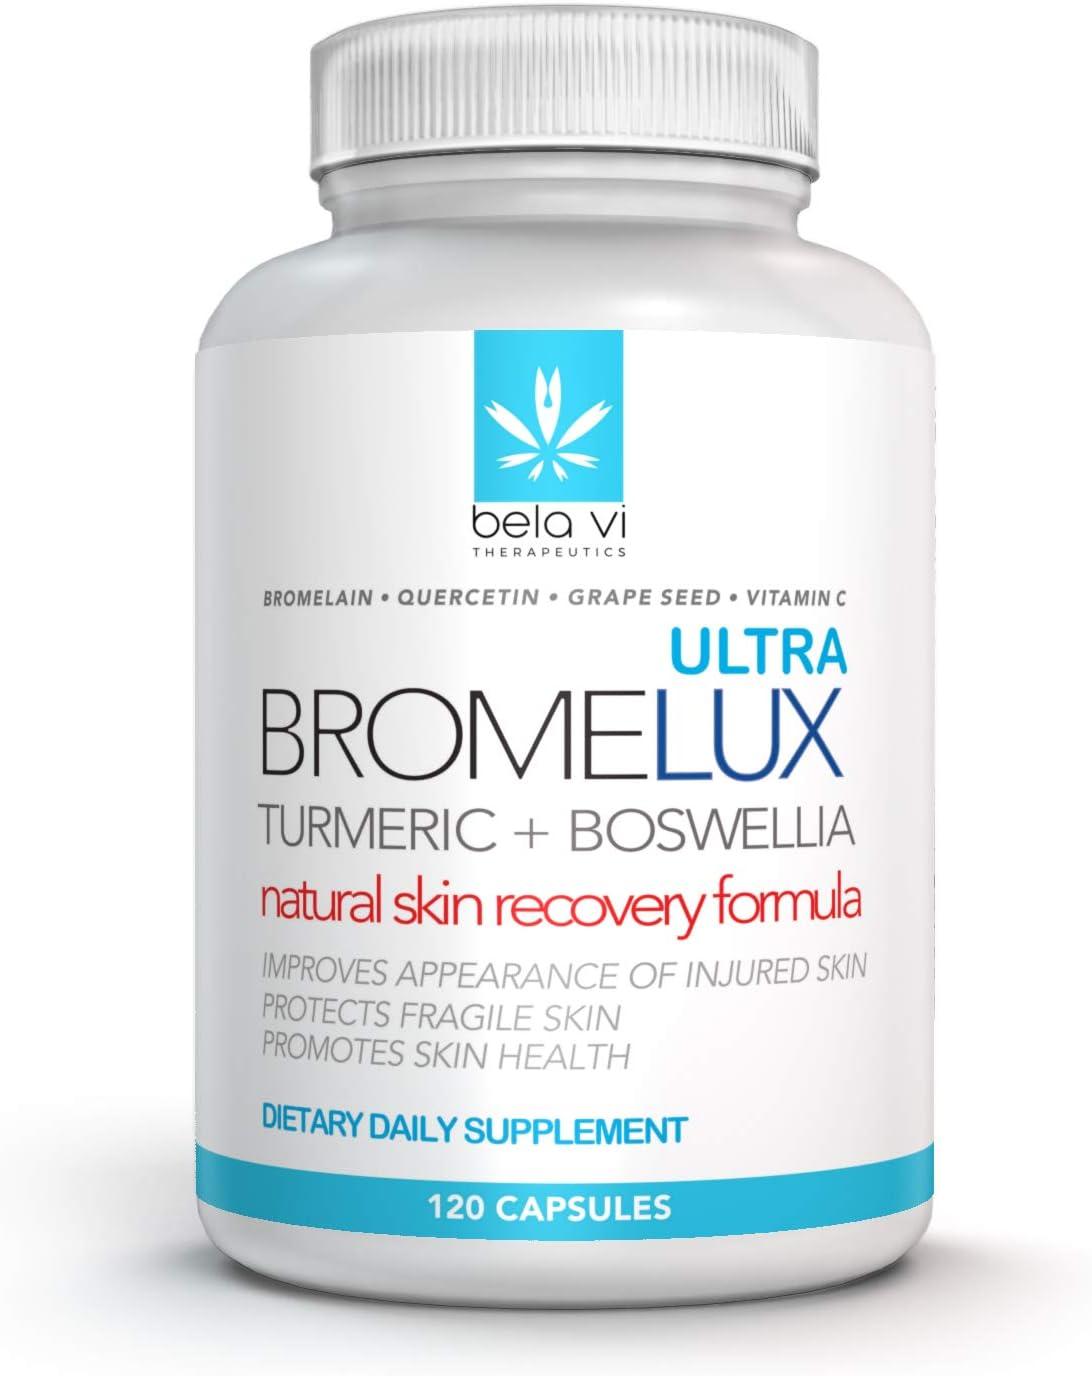 BROMELUX Spring new Luxury goods work Ultra Anti-Bruising Supplement I Bromelain Quercetin